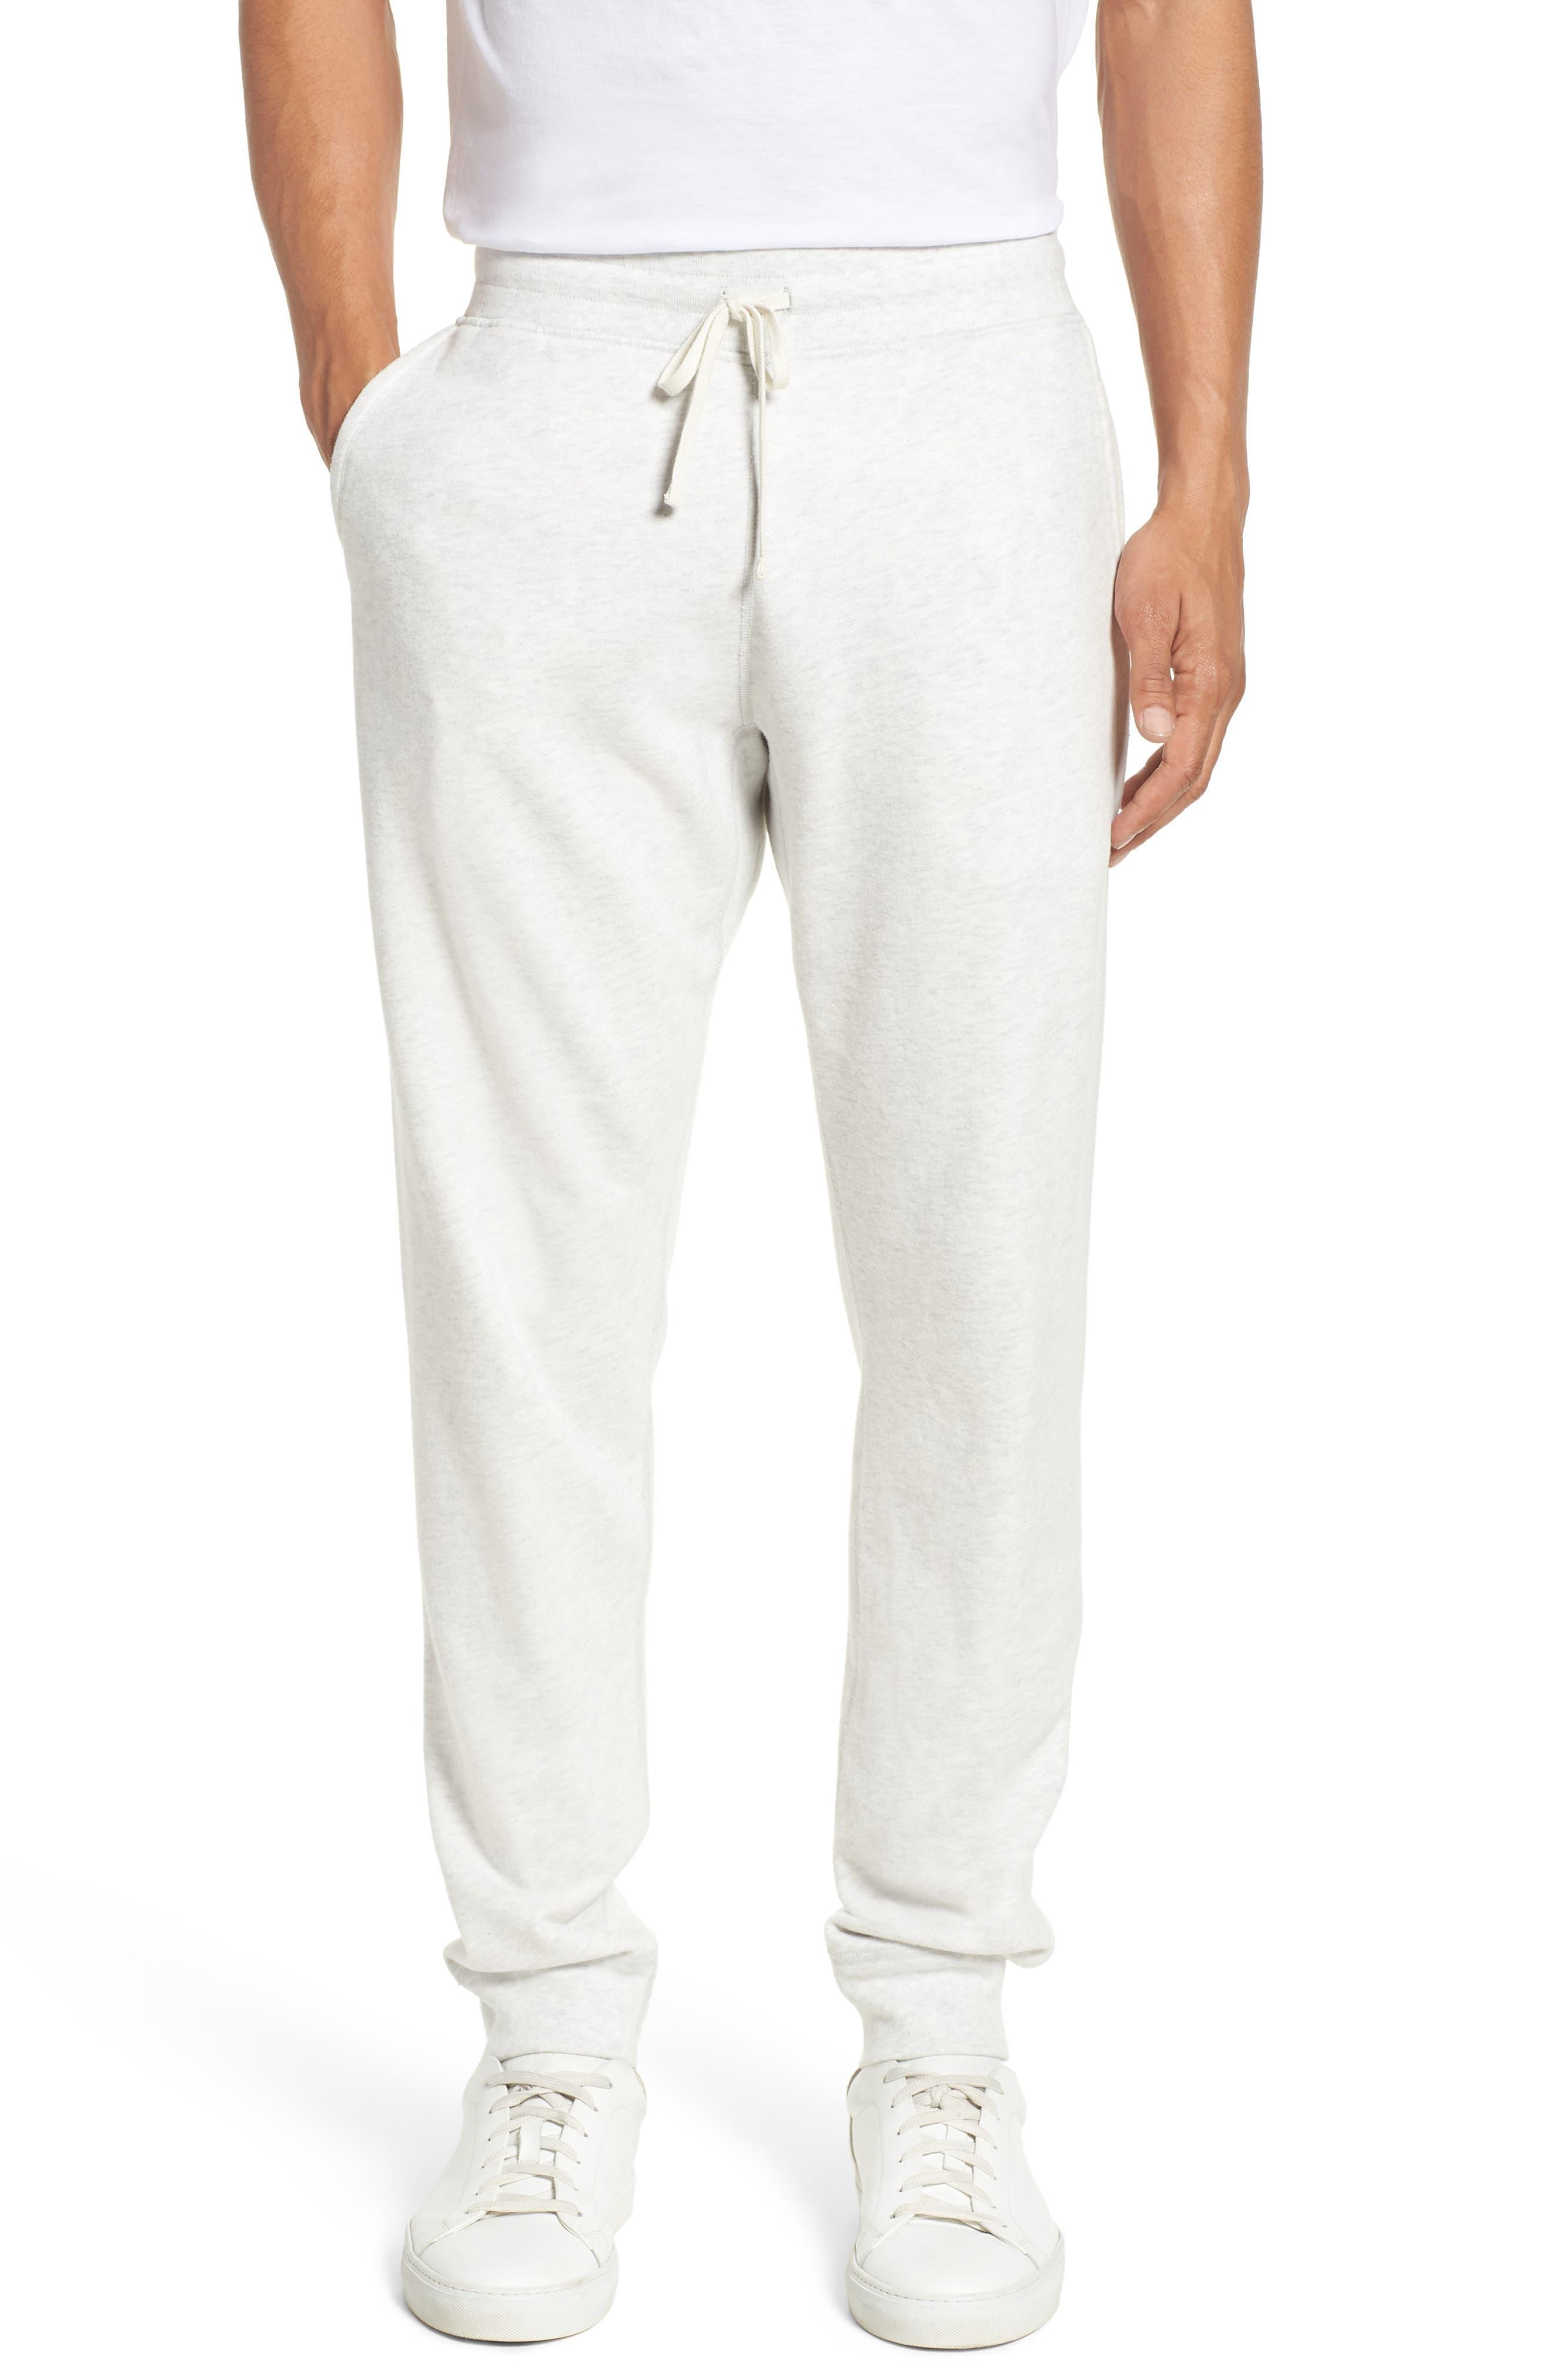 Slim Fit Sweatpants,                             Main thumbnail 1, color,                             072